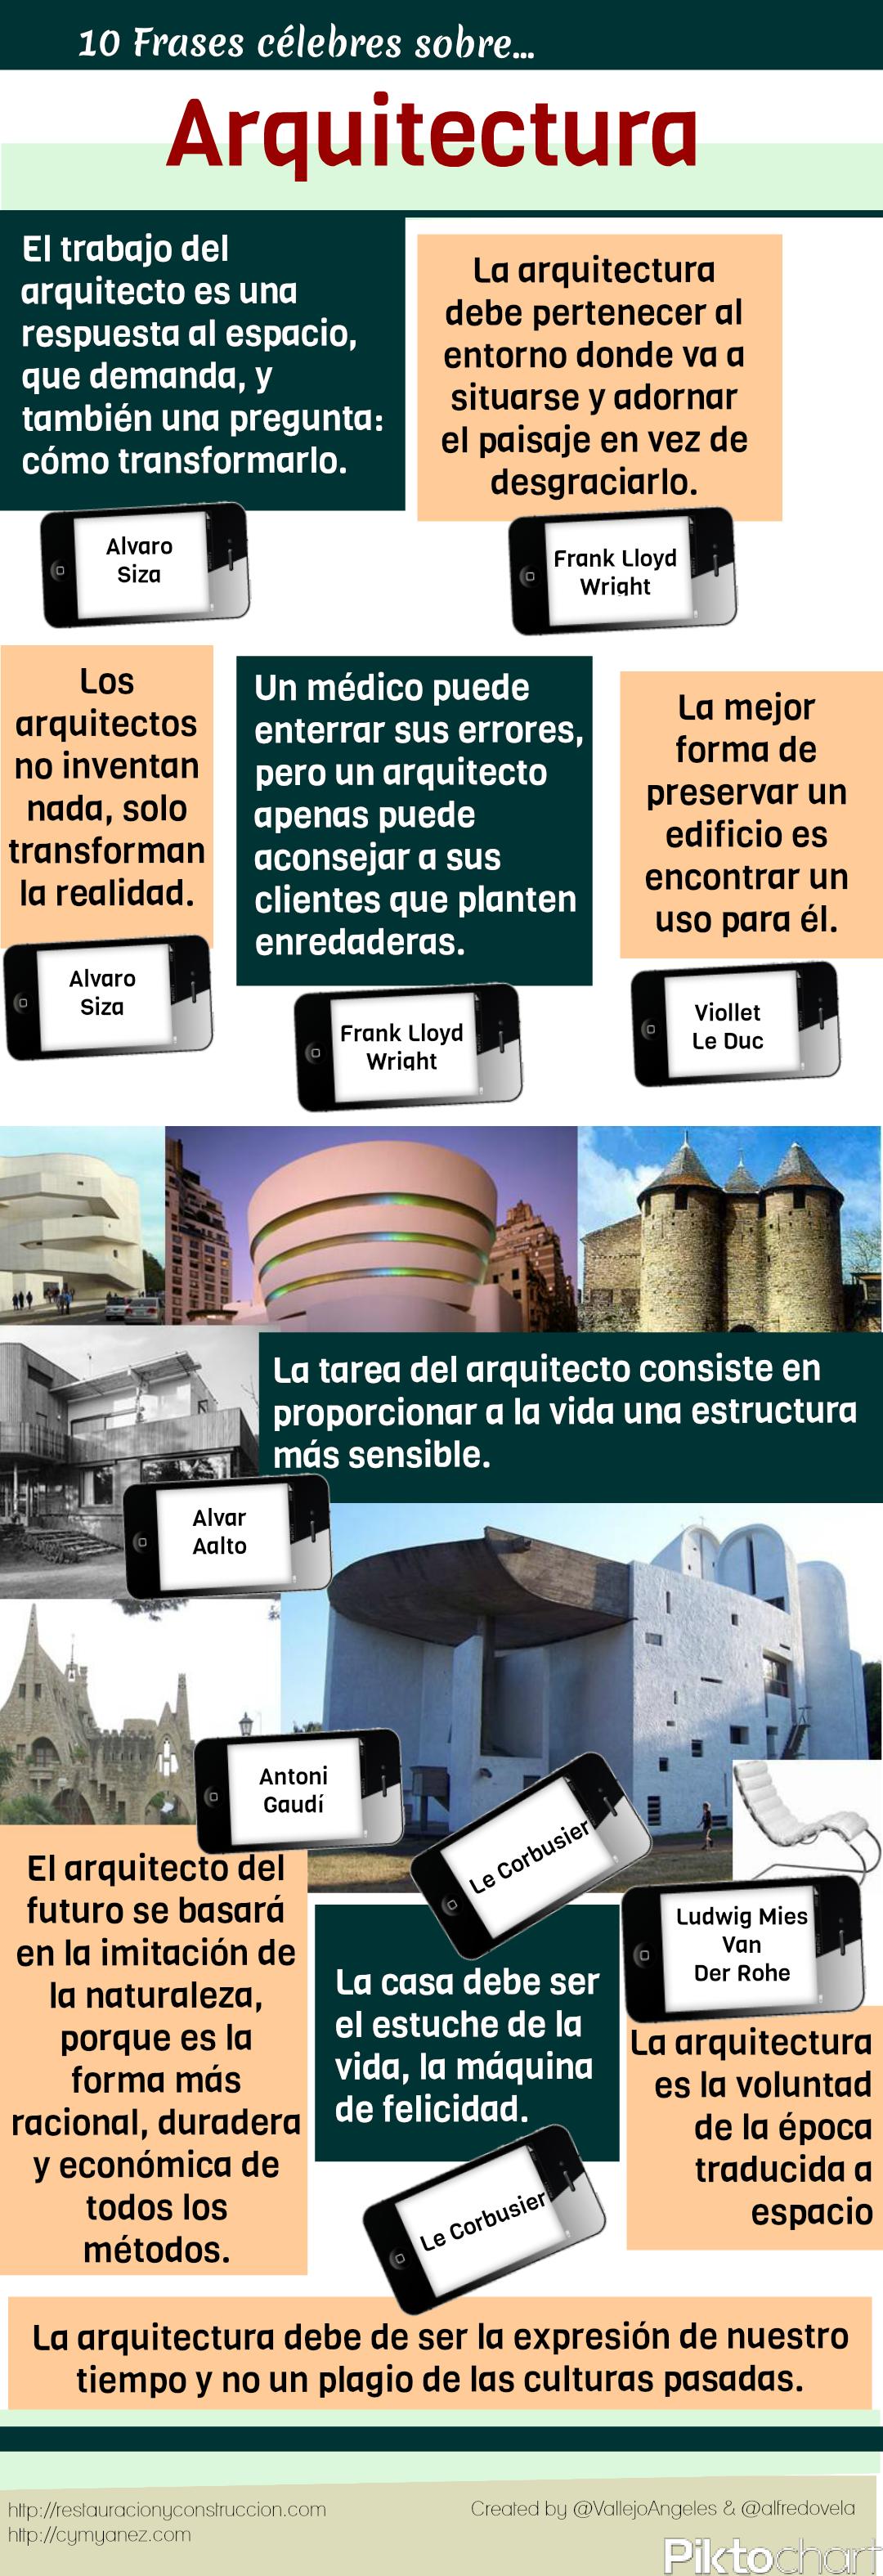 10 Frases C Lebres Sobre Arquitectura Infografia